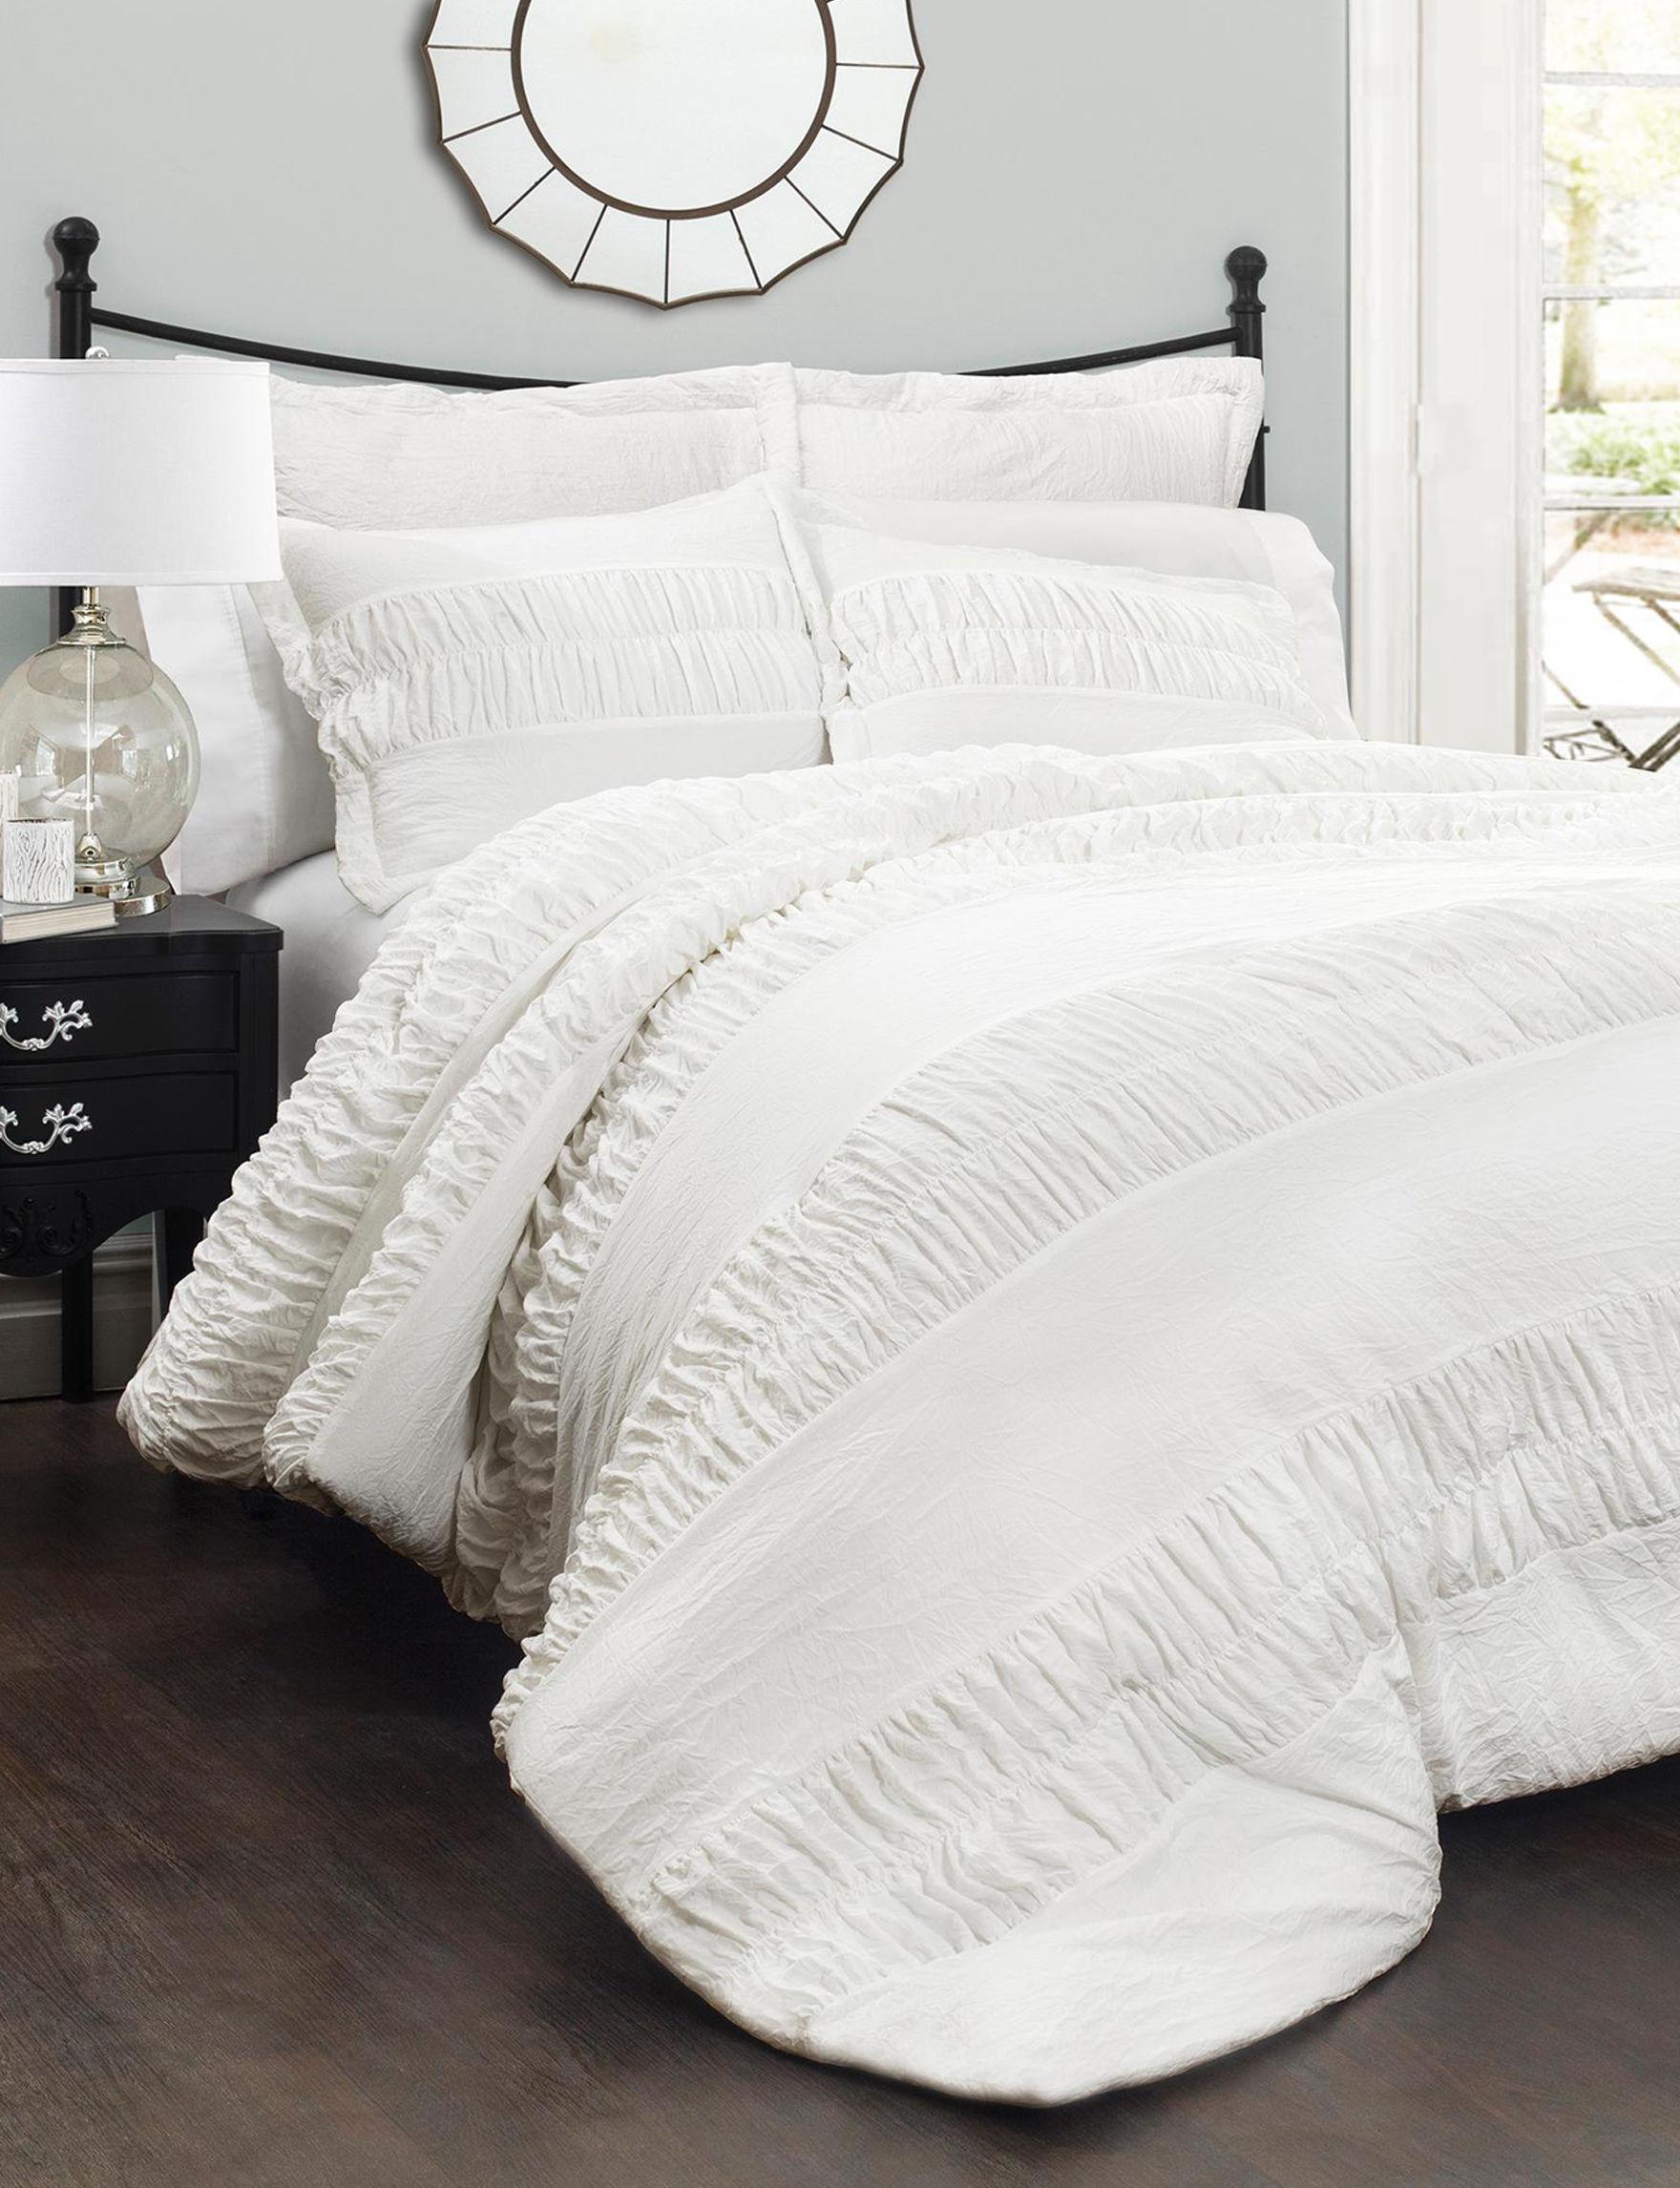 Lush Decor White Comforters & Comforter Sets